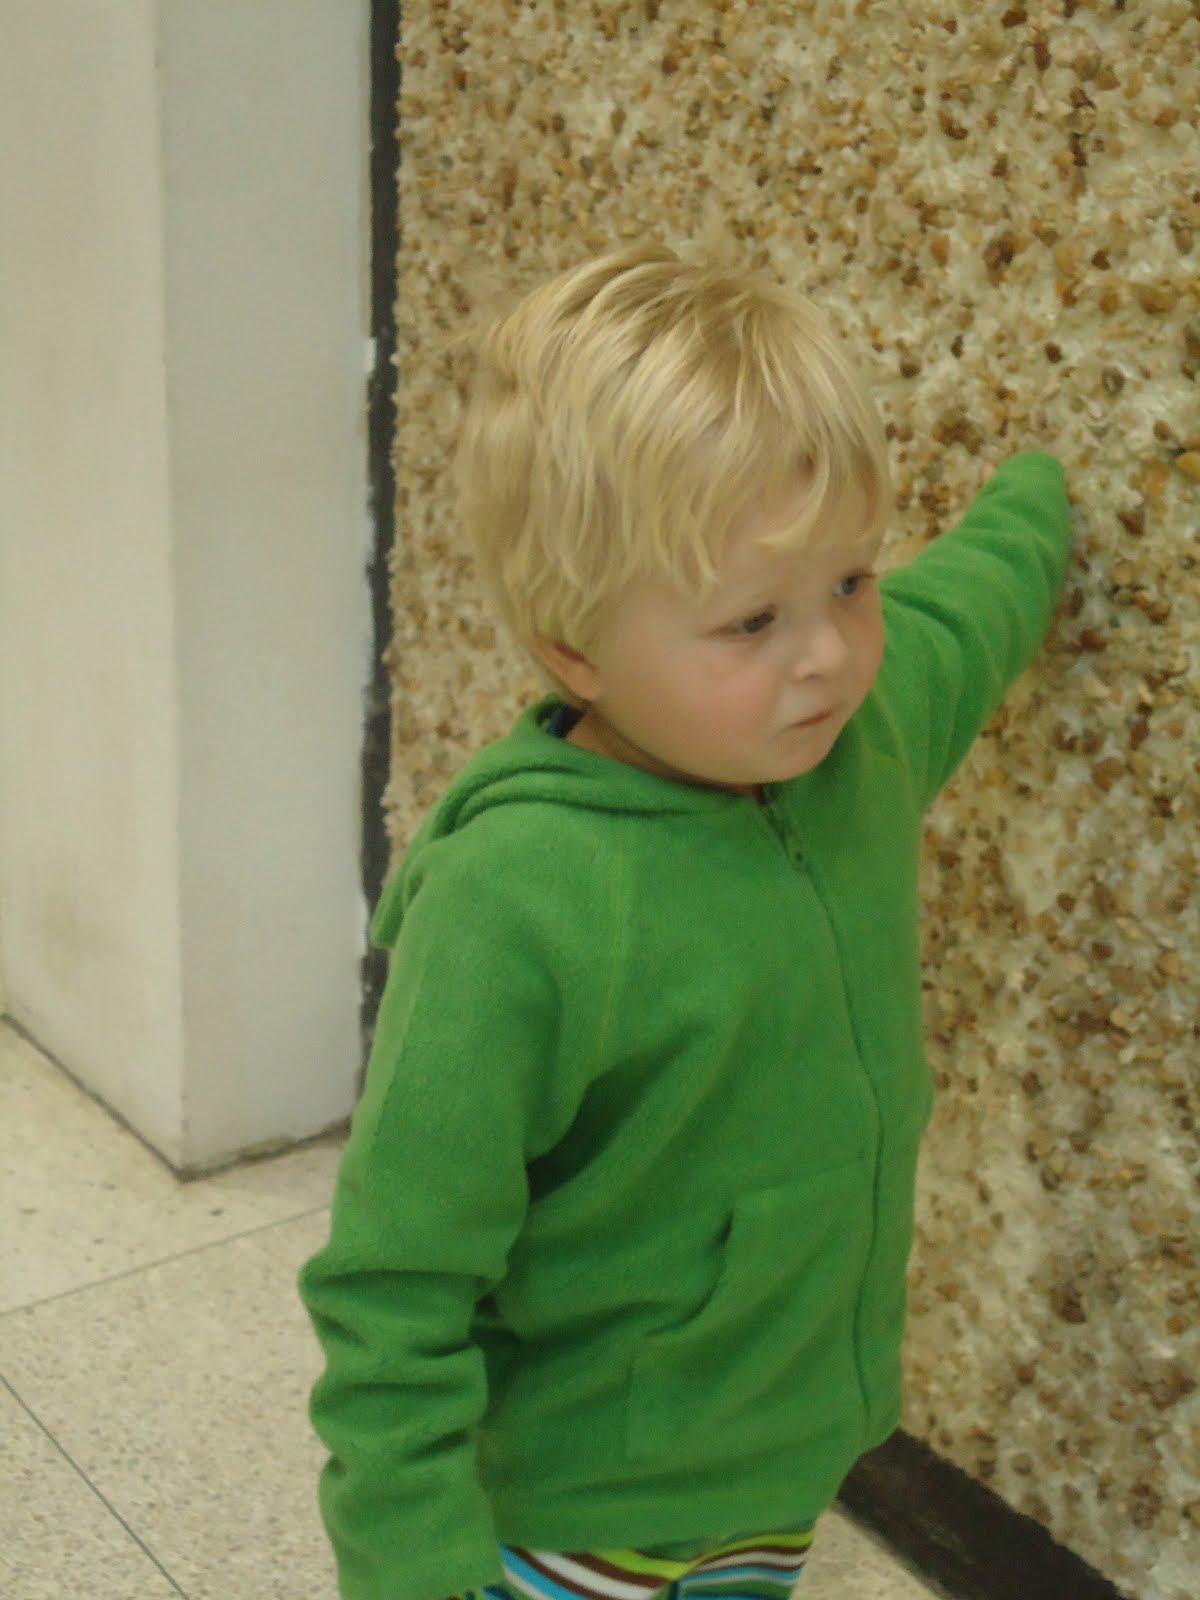 imgsrc.su toddlers - DriverLayer Search Engine